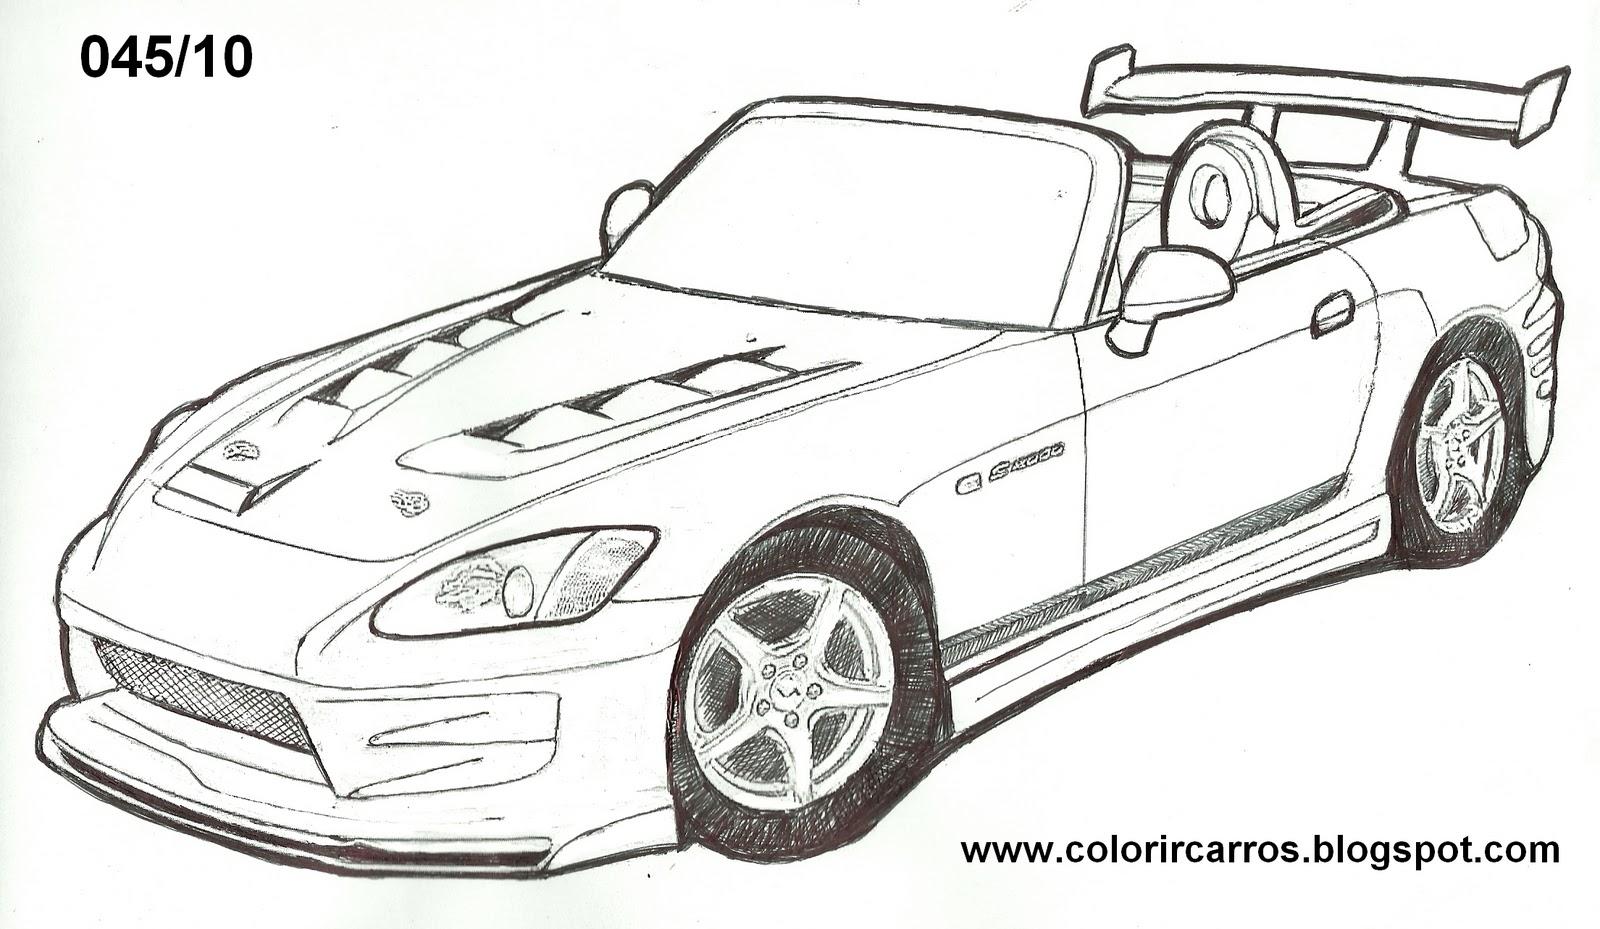 Postado Por Colorir Carros As 14 12 0 Comentarios